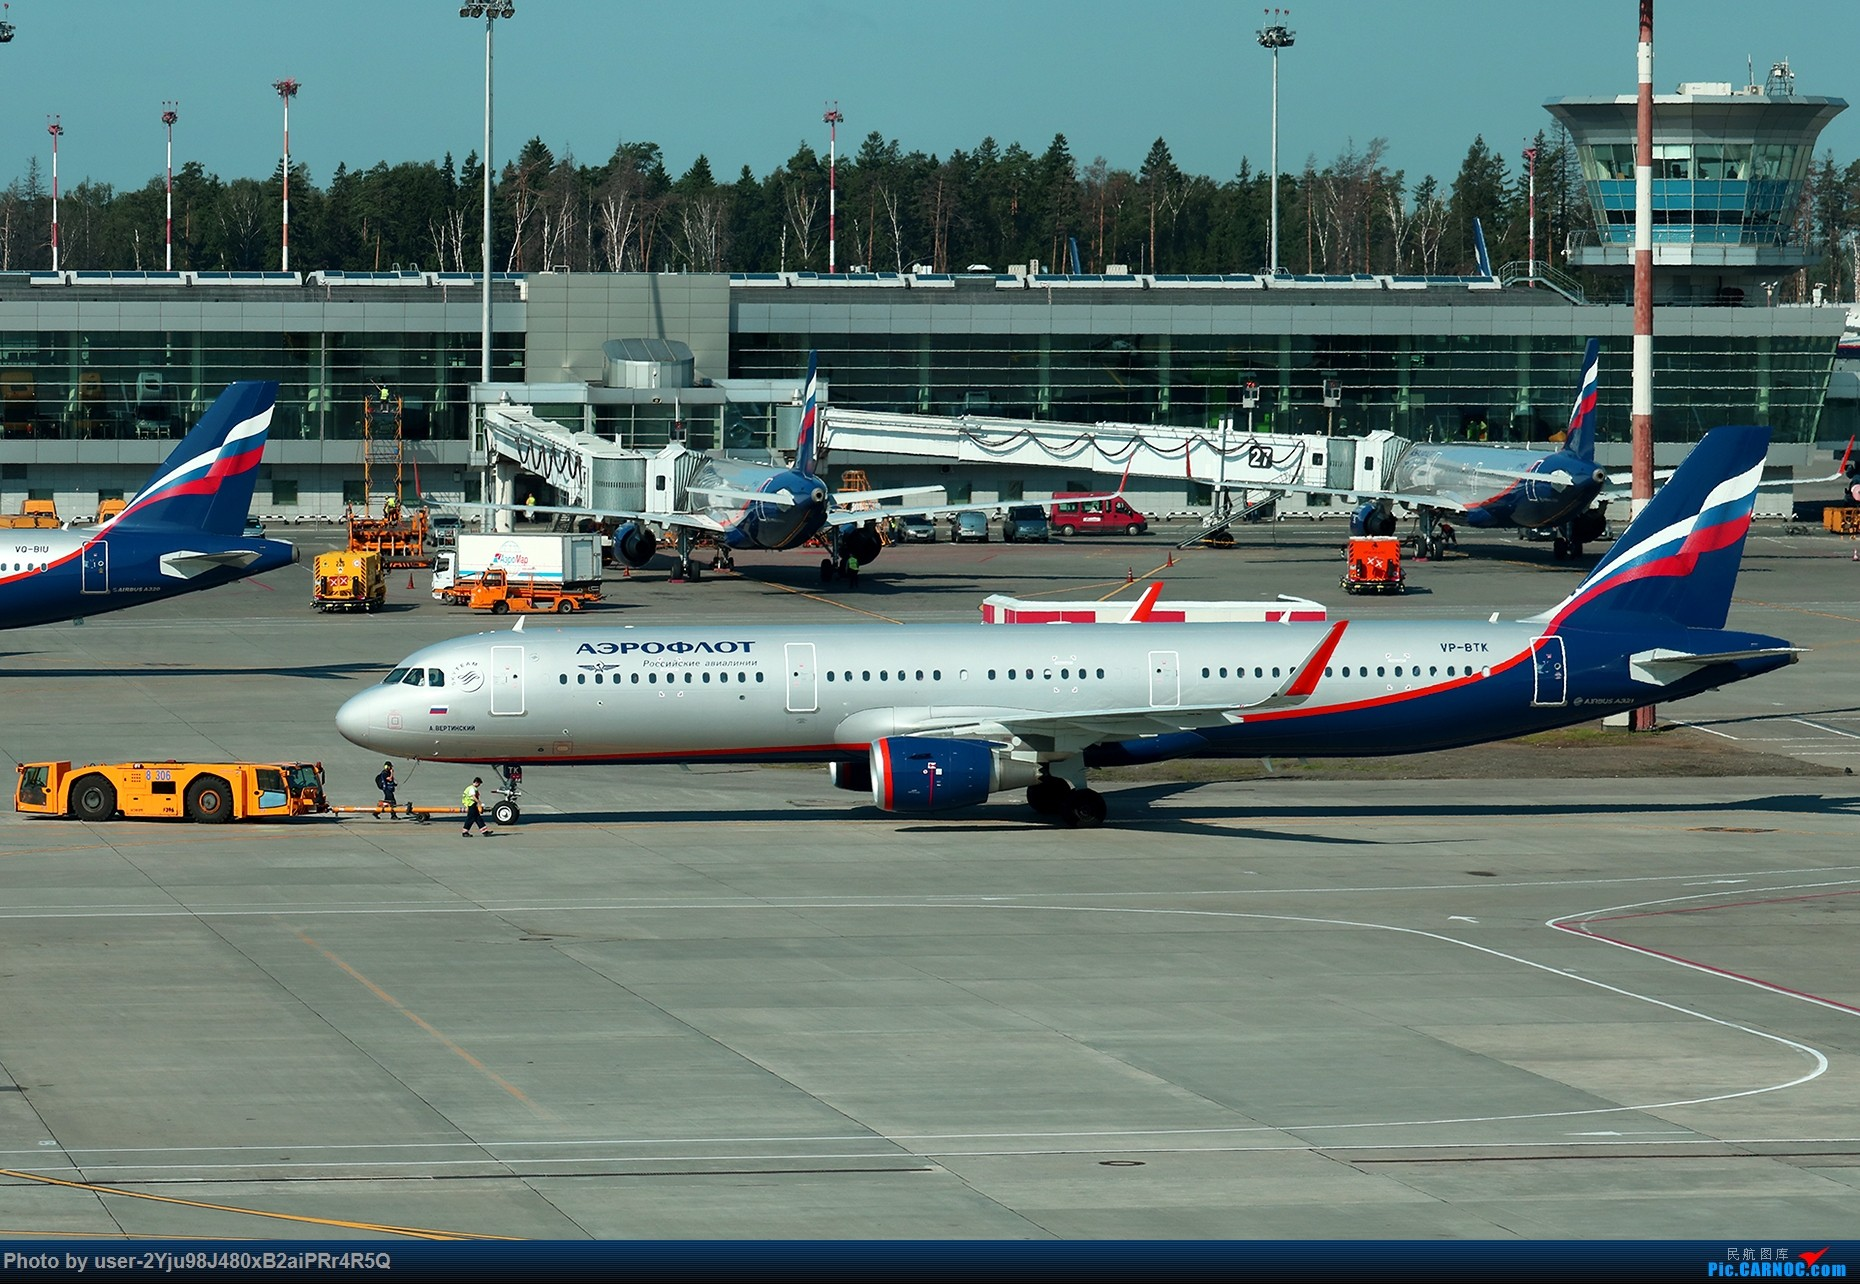 Re:[原创]LIULIU Sheremetyevo的漫游 Aeroflot毛航篇 AIRBUS A321-211(SL) VP-BTK 俄罗斯谢诺梅杰沃机场